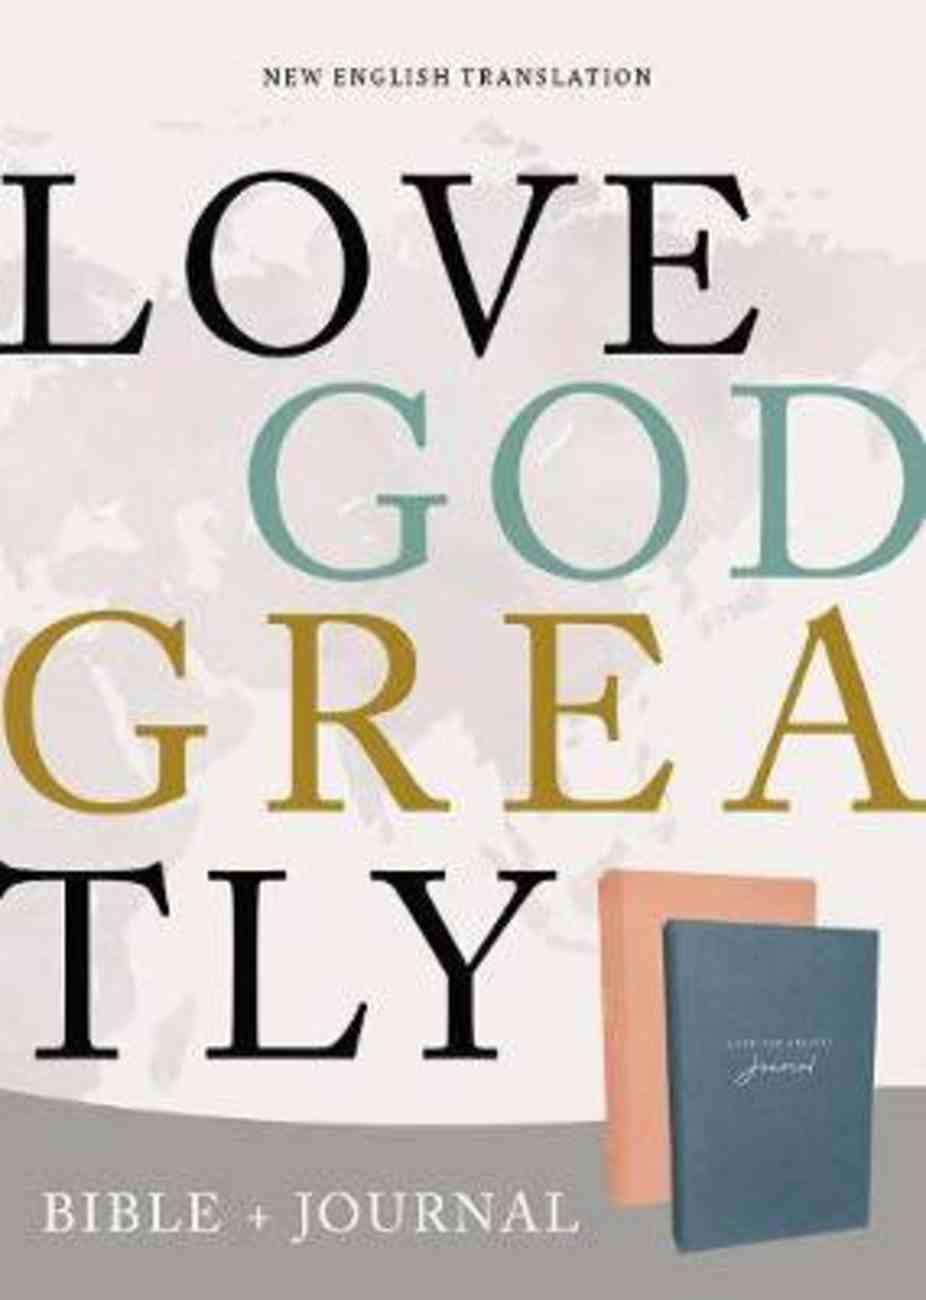 NET Love God Greatly Bible/Journal Combo Hardback